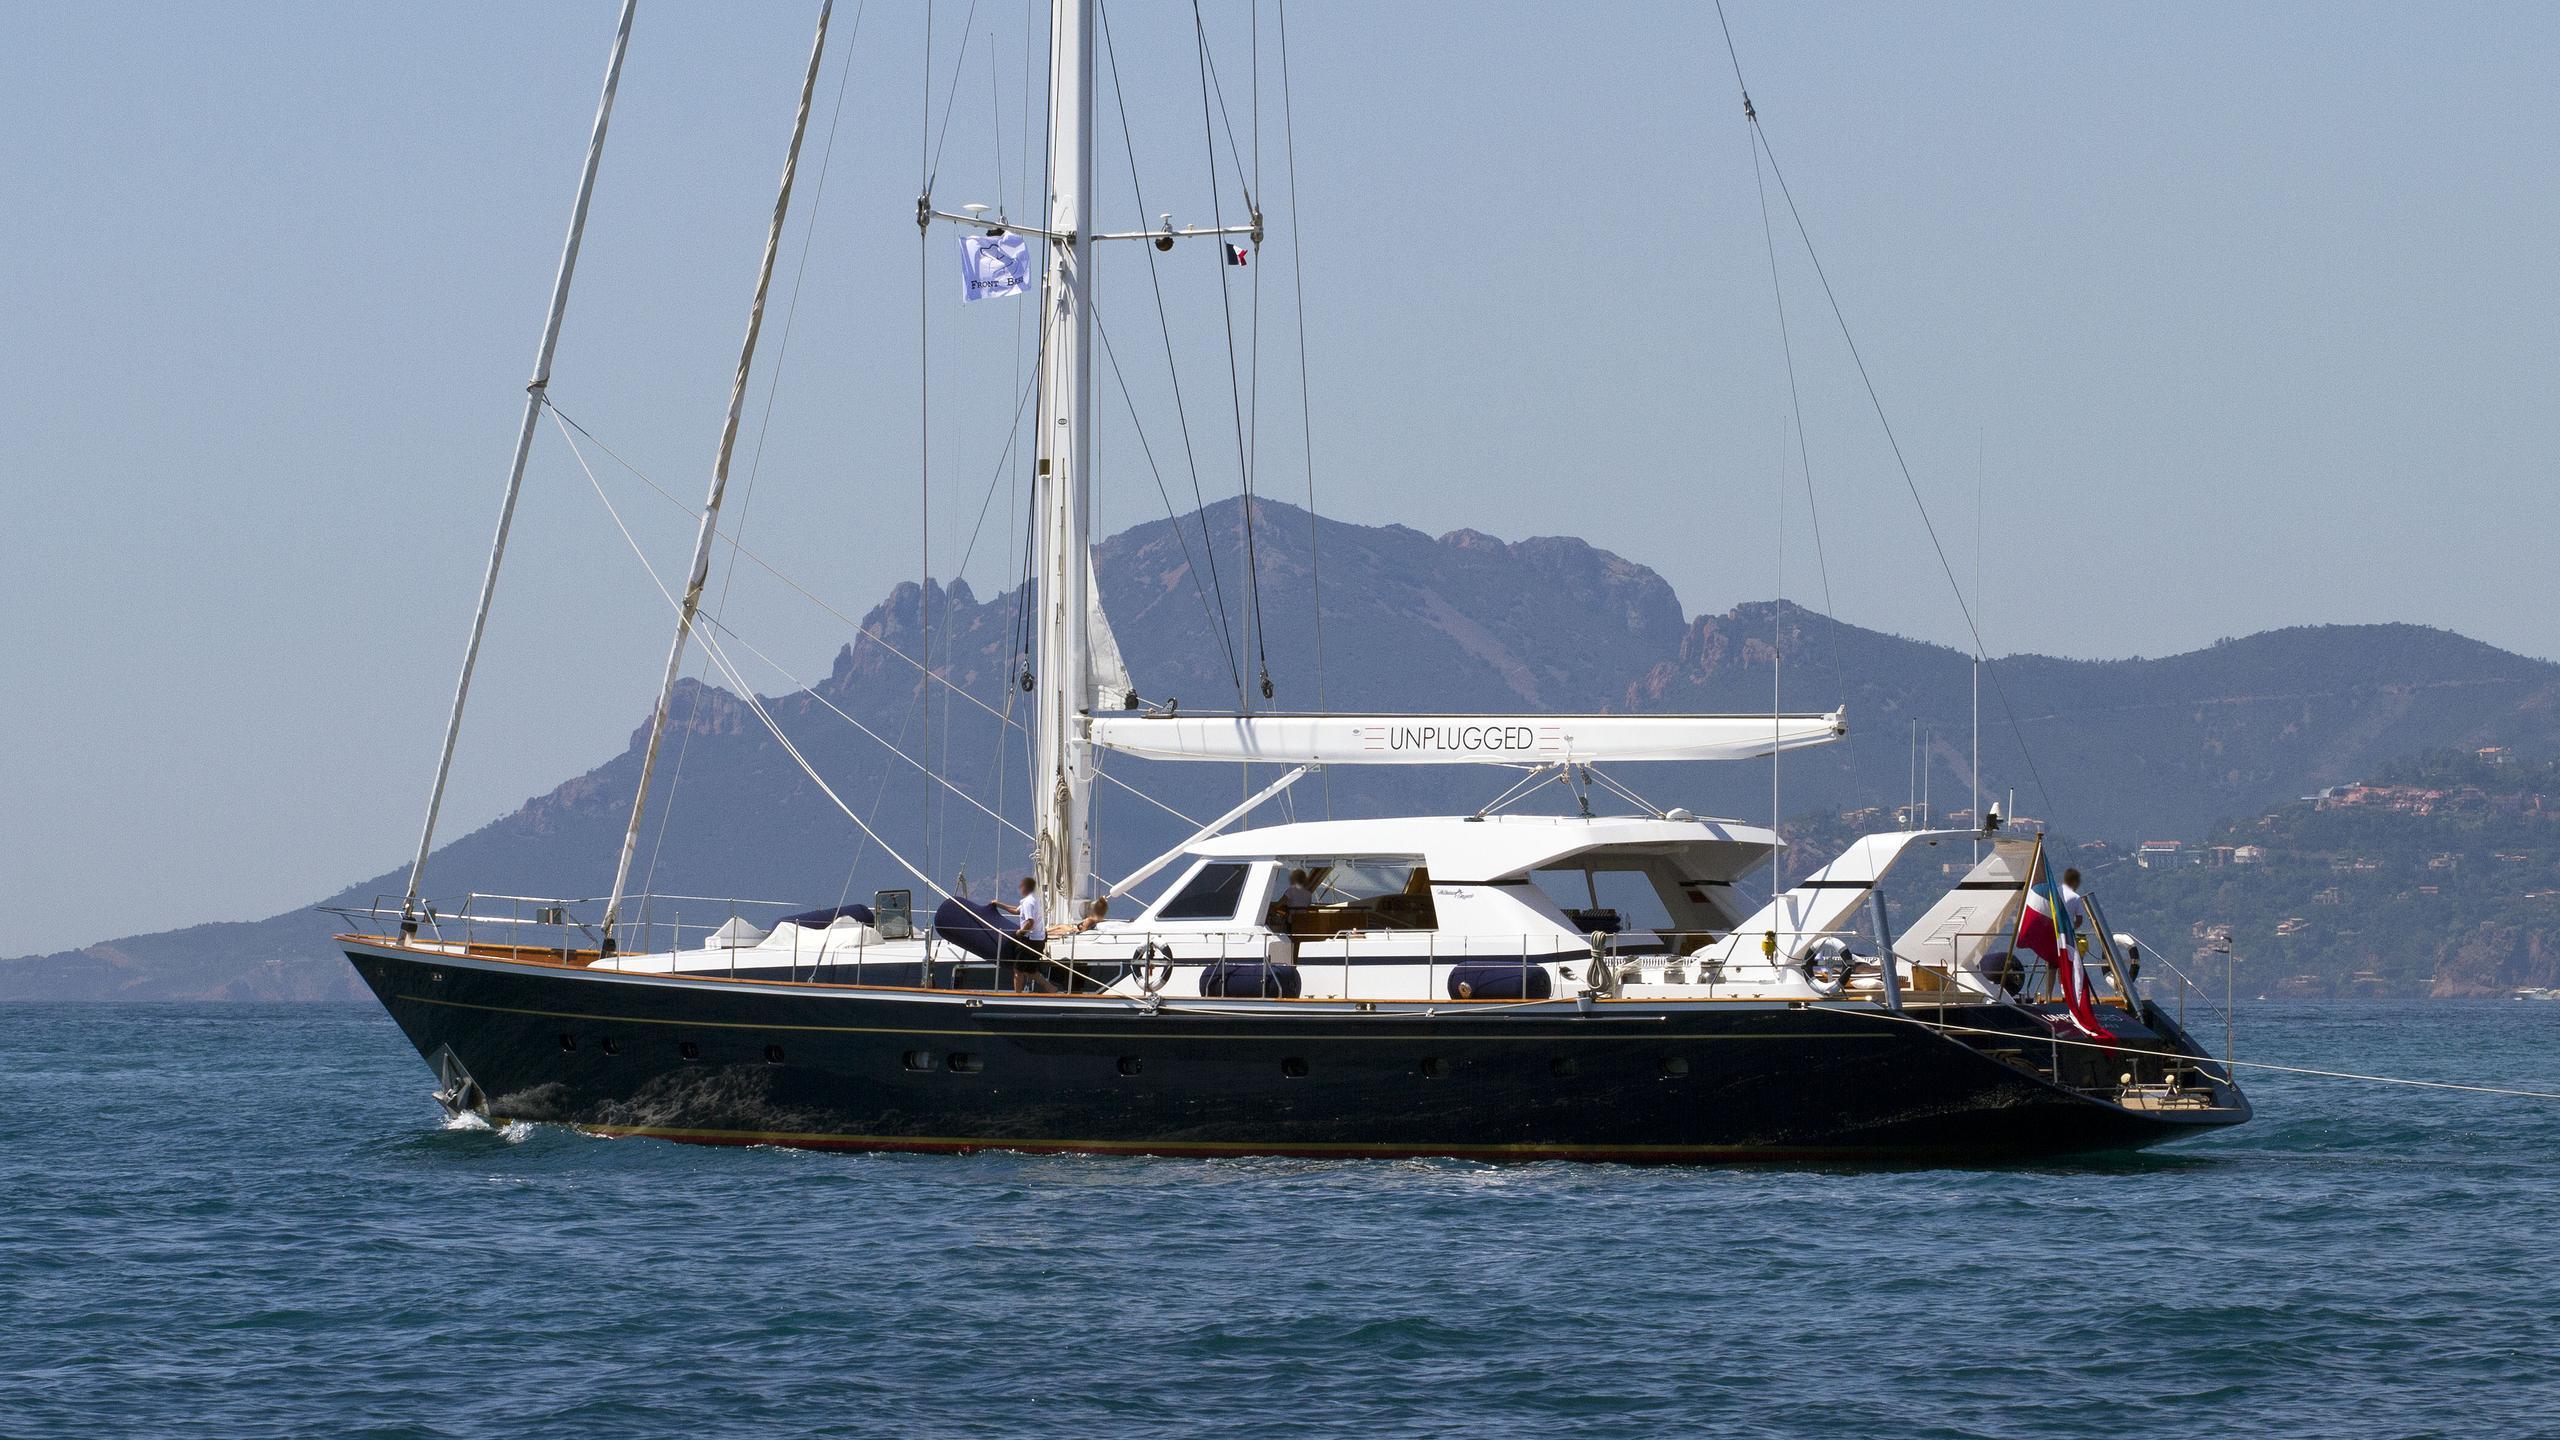 unplugged-sailing-yacht-valdettaro-112-1992-34m-unning-half-profile